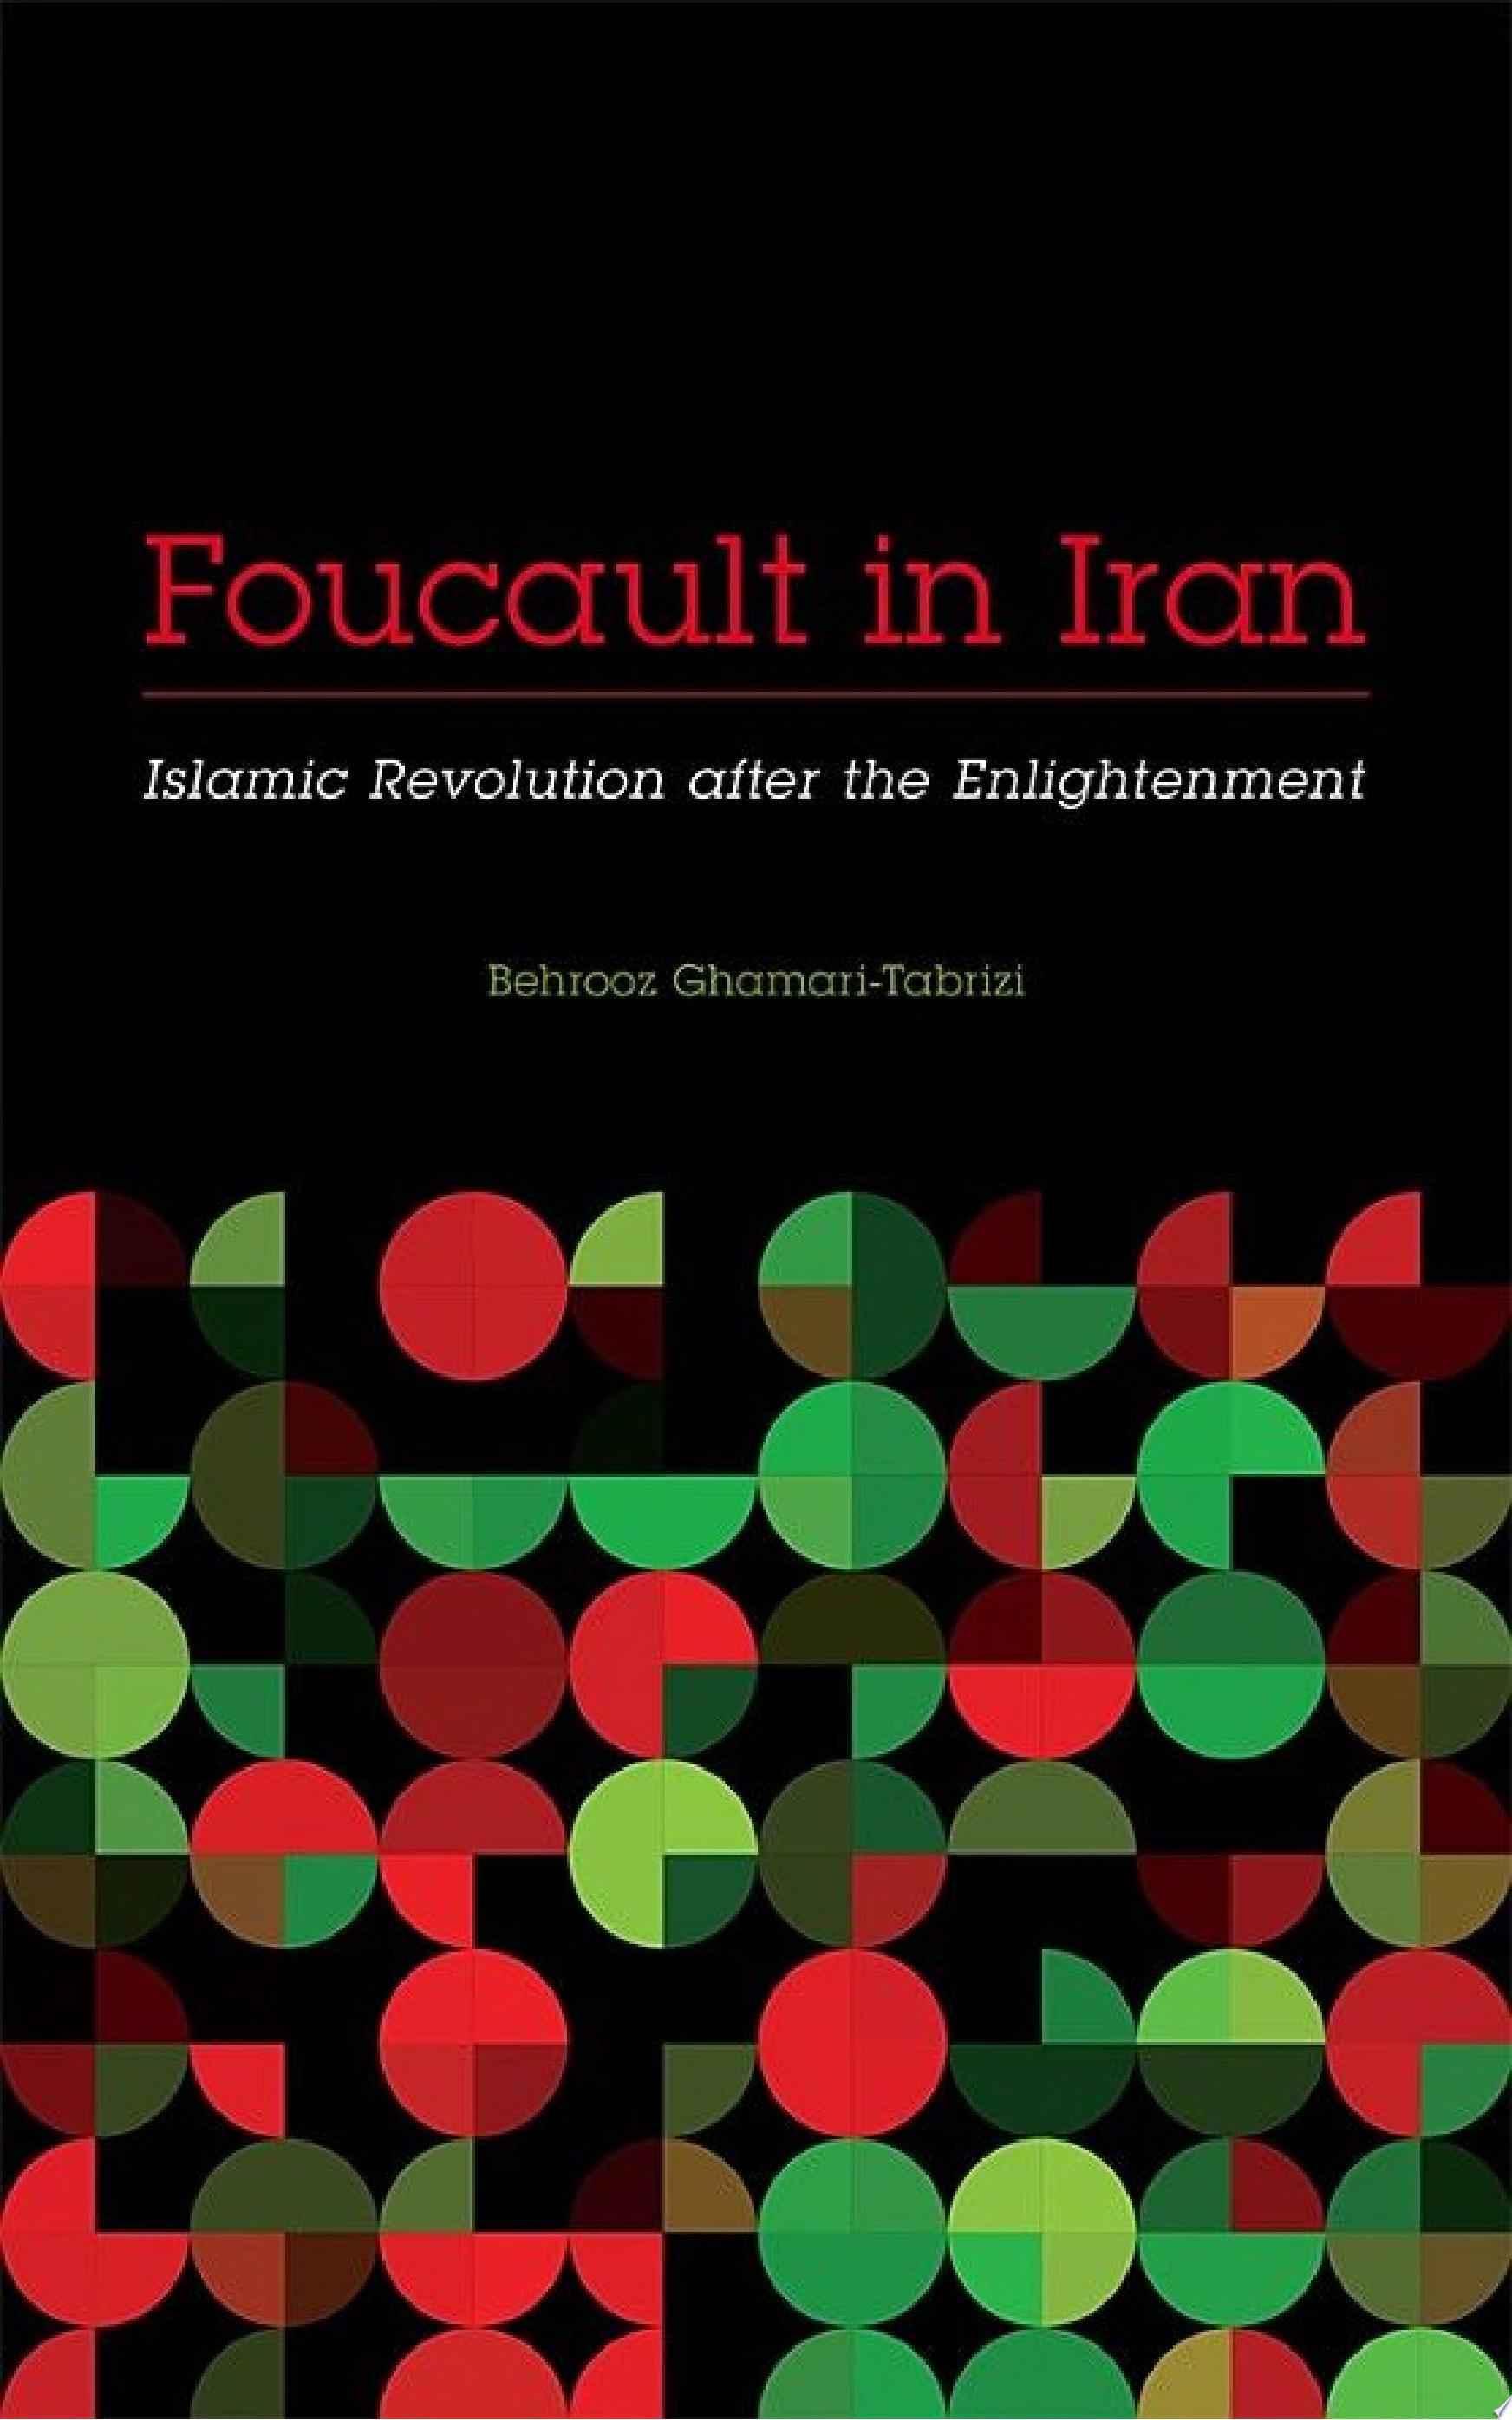 Foucault in Iran